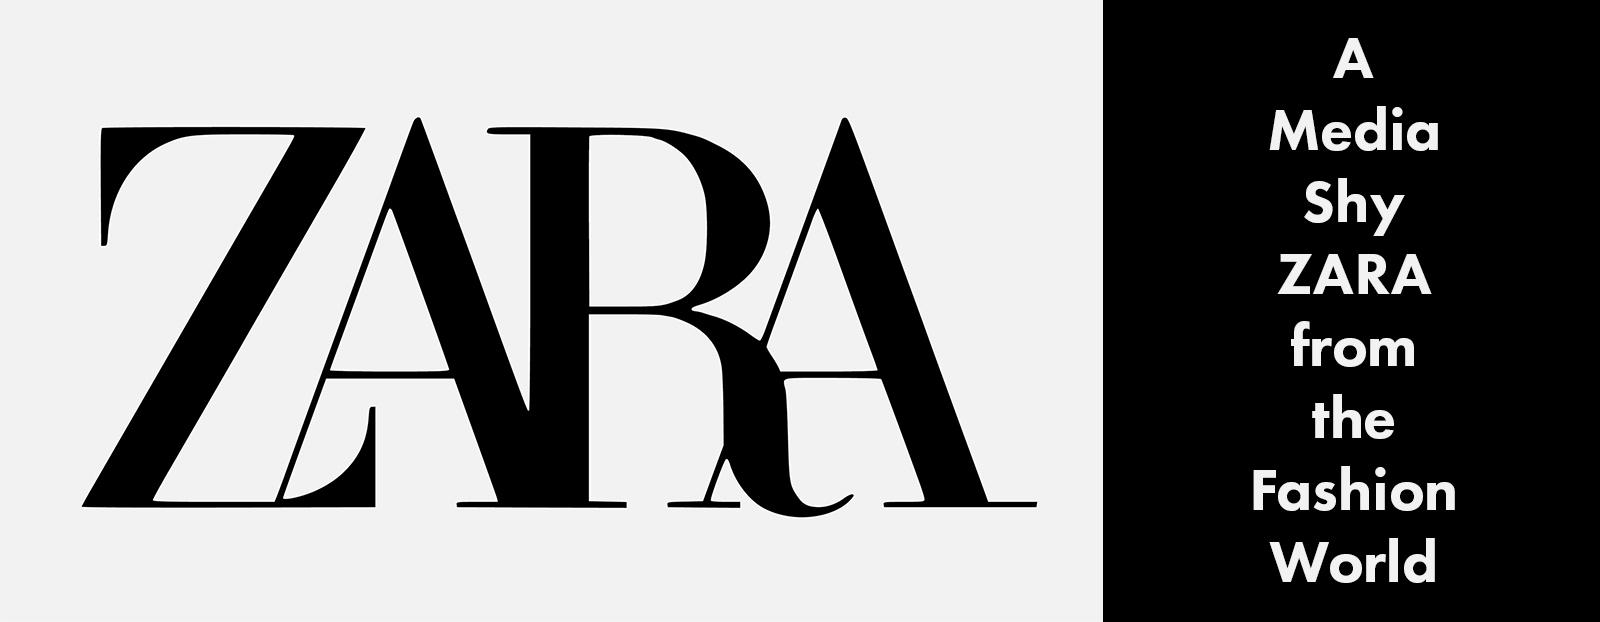 A Media Shy ZARA From the Fashion World